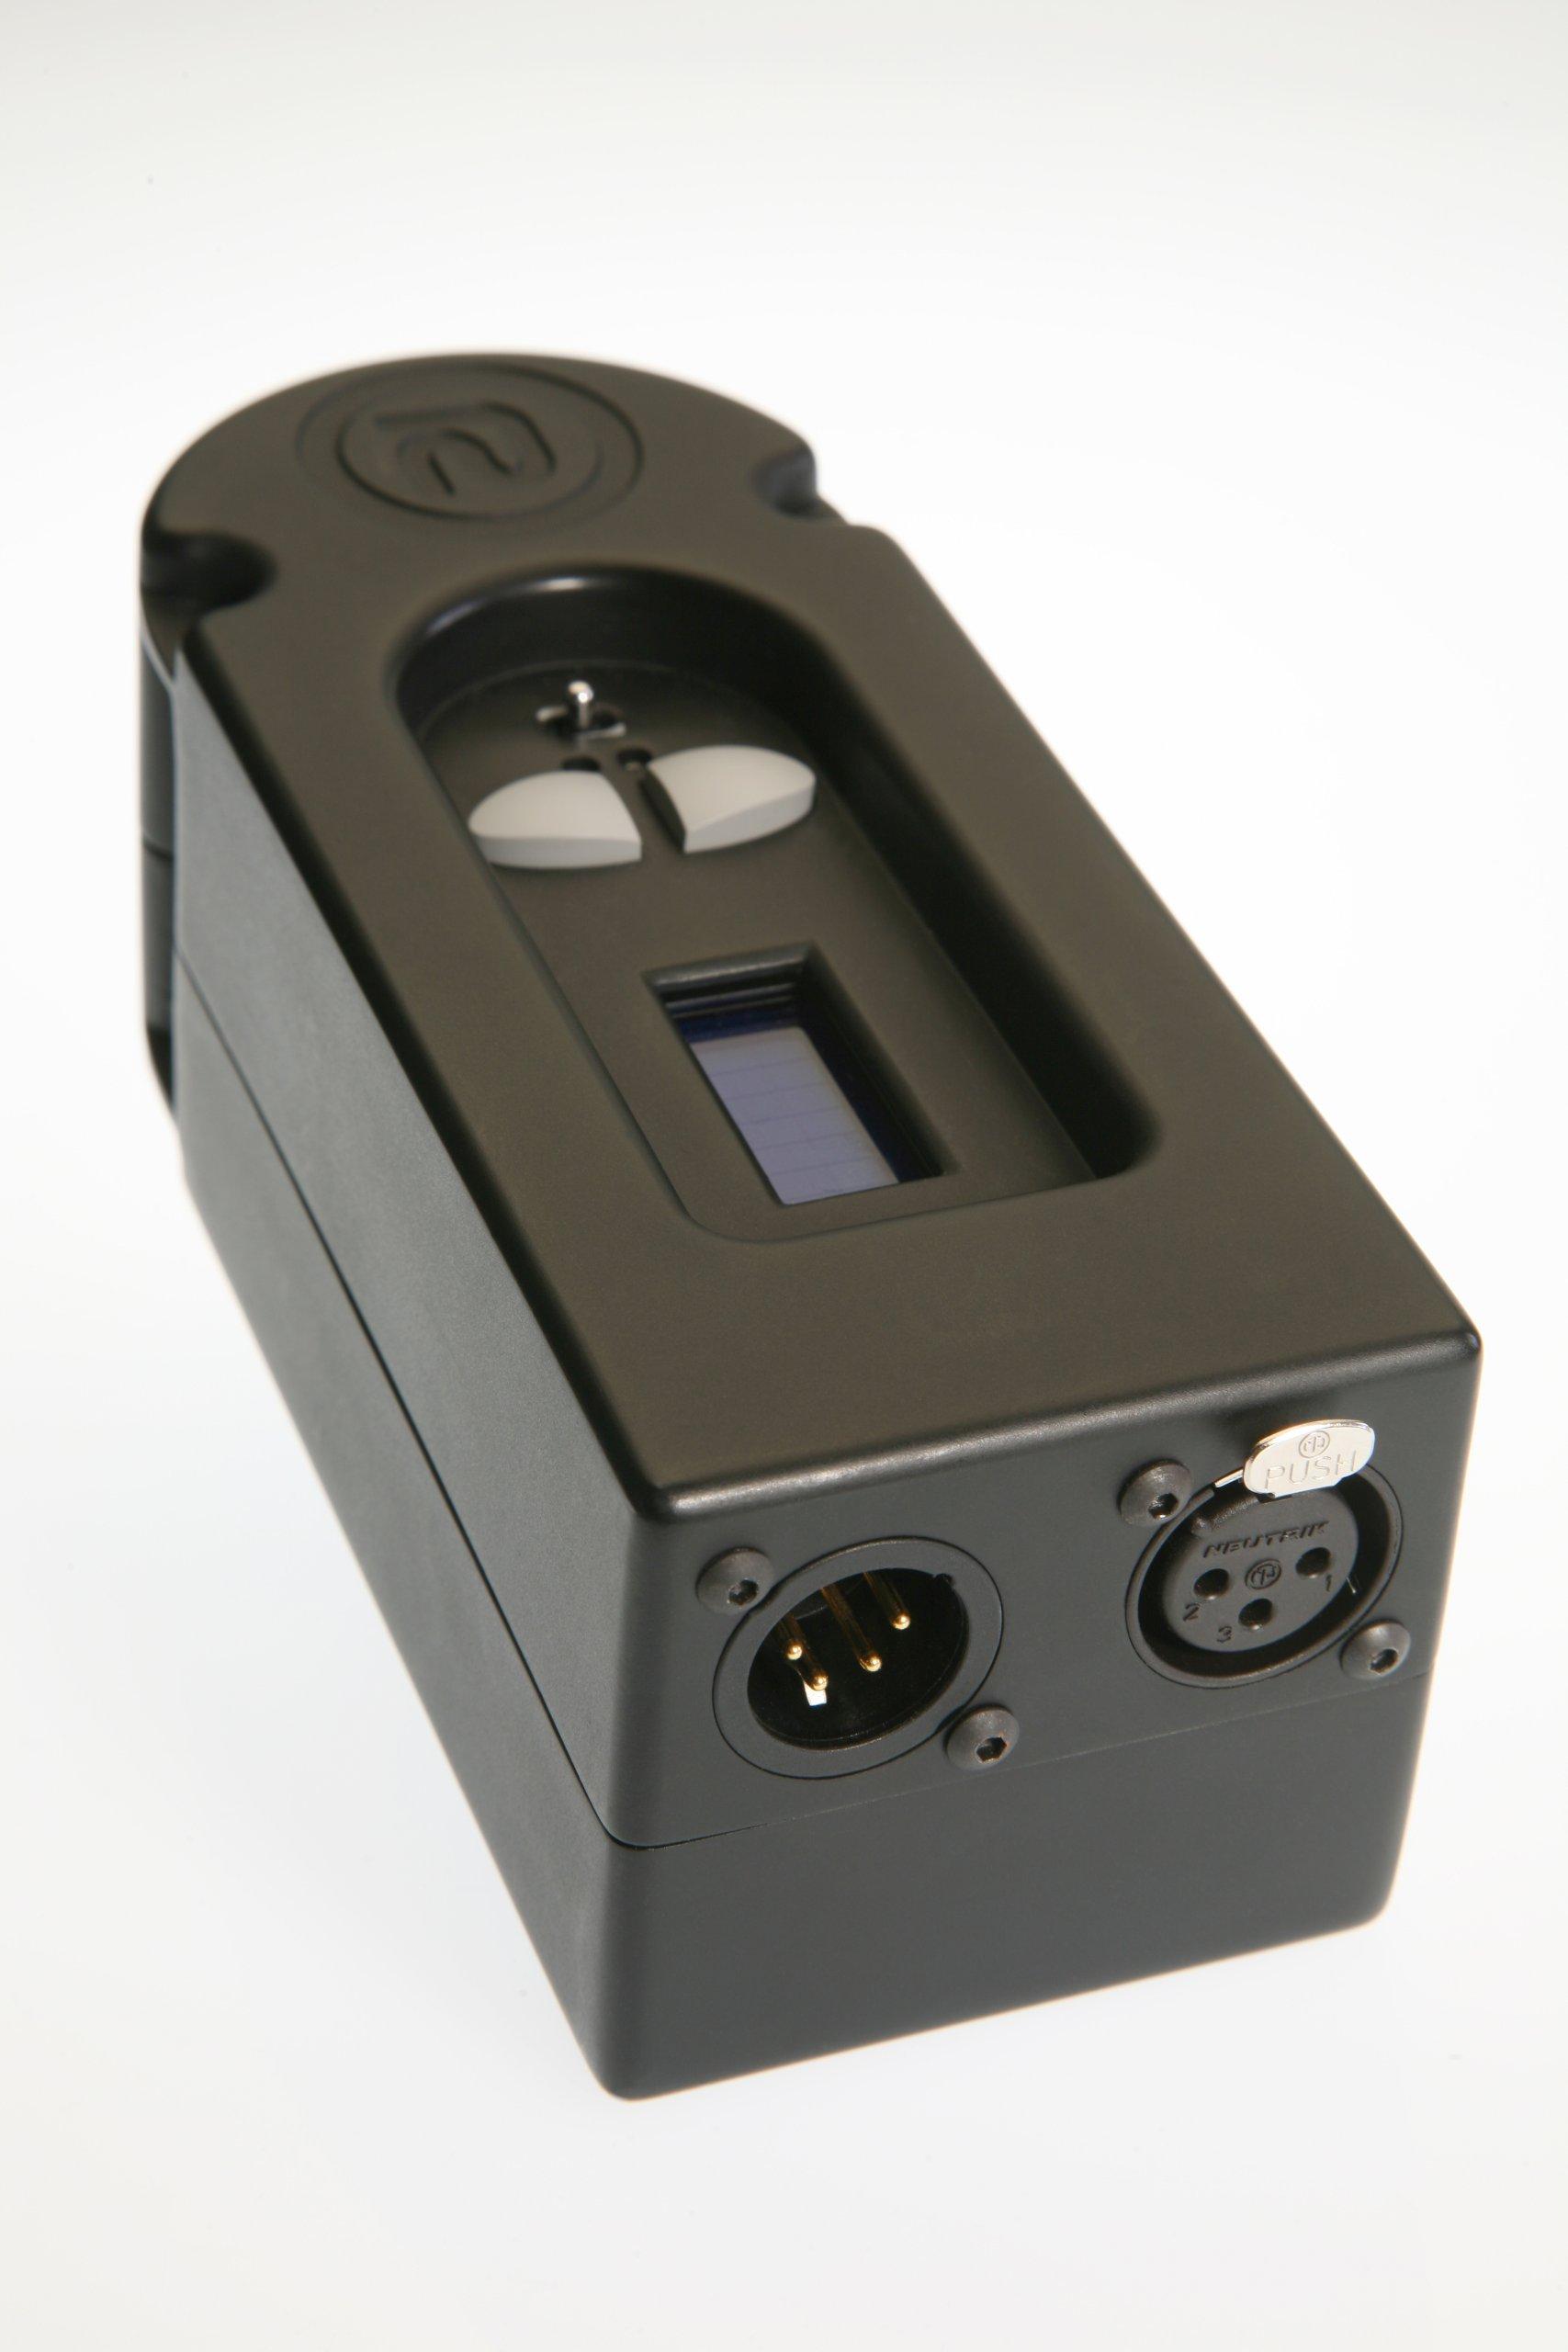 Reflecmedia RM1121DS 12'x7' Small Duo Litering Kit